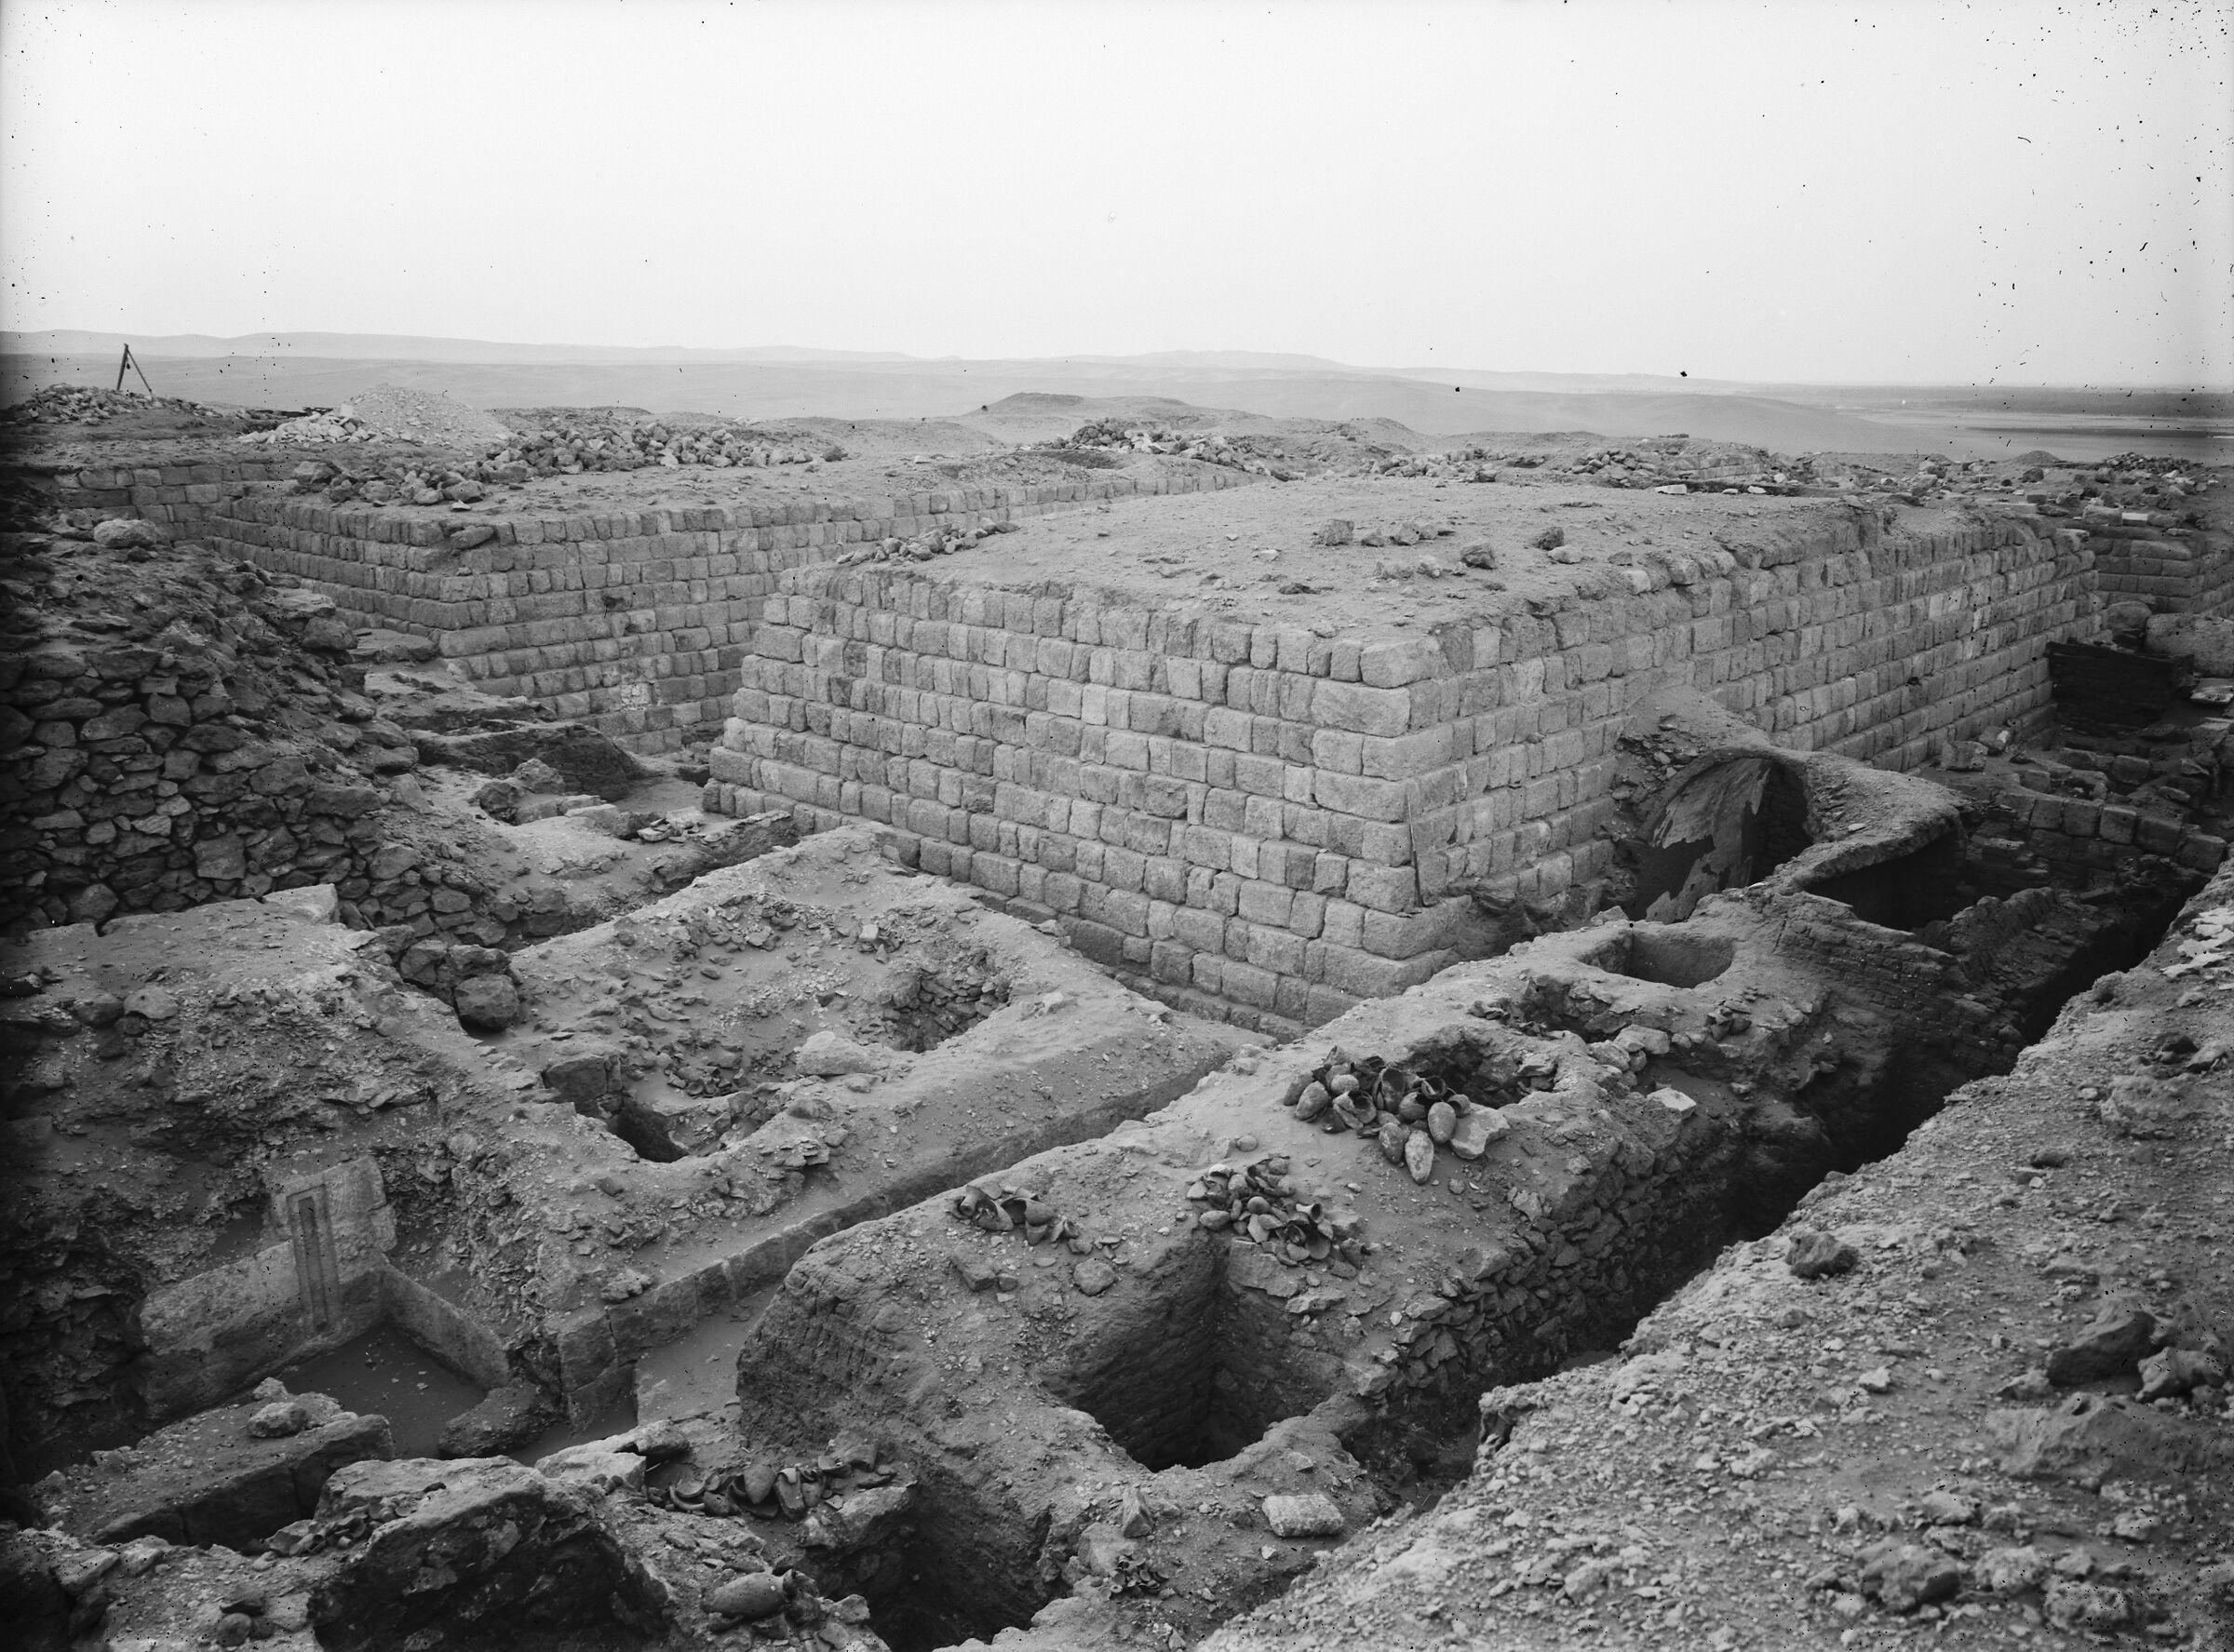 Western Cemetery: Site: Giza; View: G 1366, G 1364, G 1365, G 1360, G 1203, G 1205